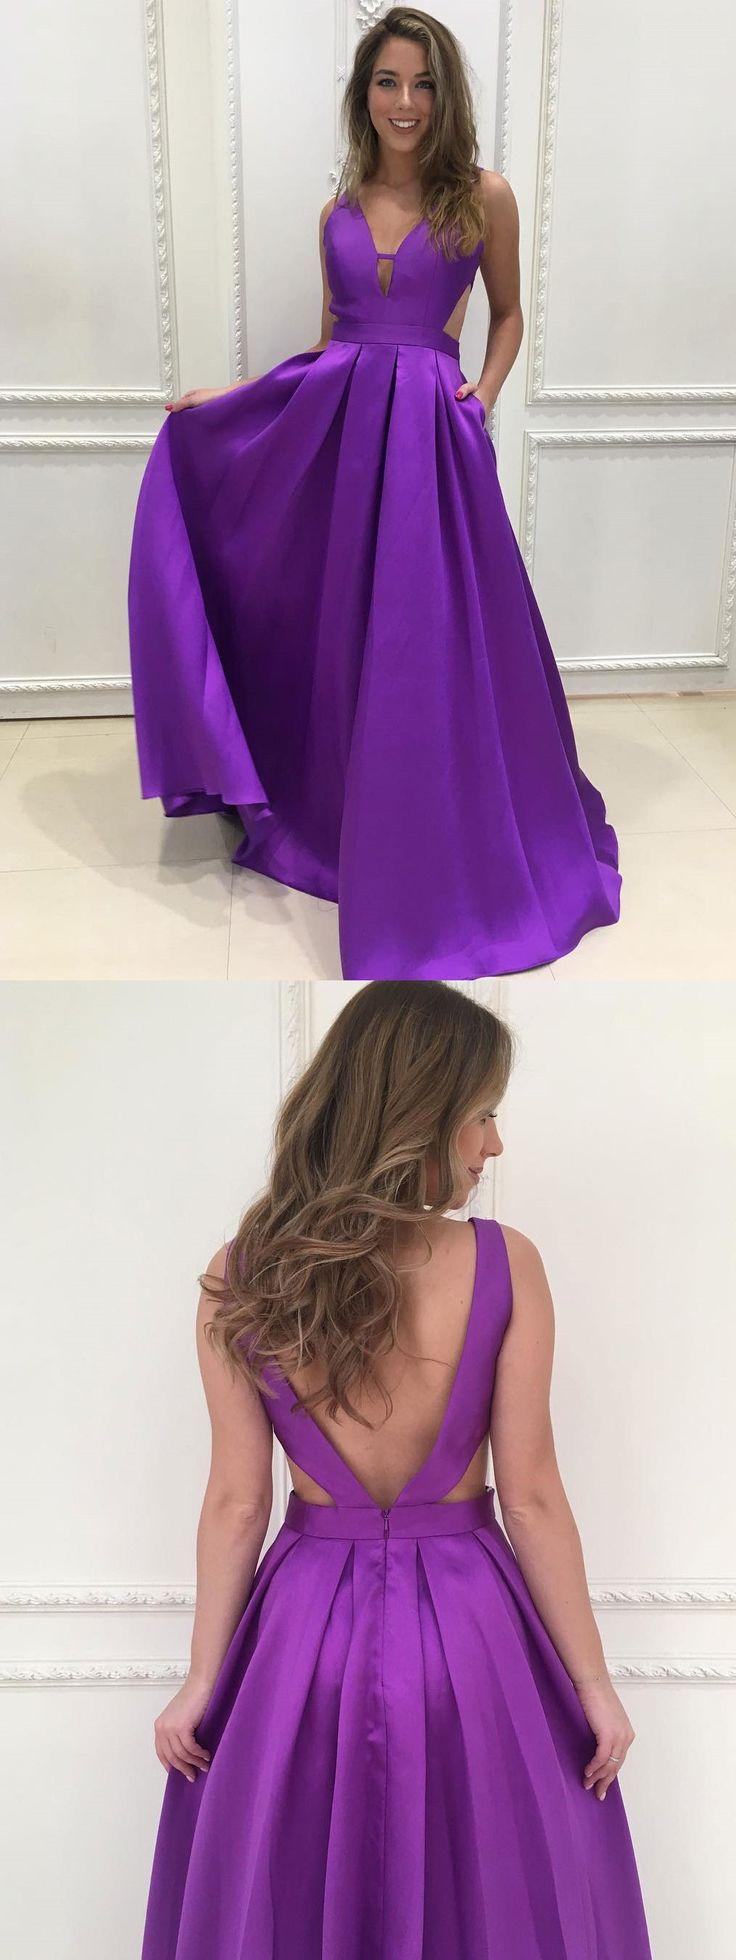 A-line Deep-V Sweep Train Simple Sexy Prom Dresses 2765 #promdresses #prom2k18 #sexy #simple #specials #deep-v #fashion #woman